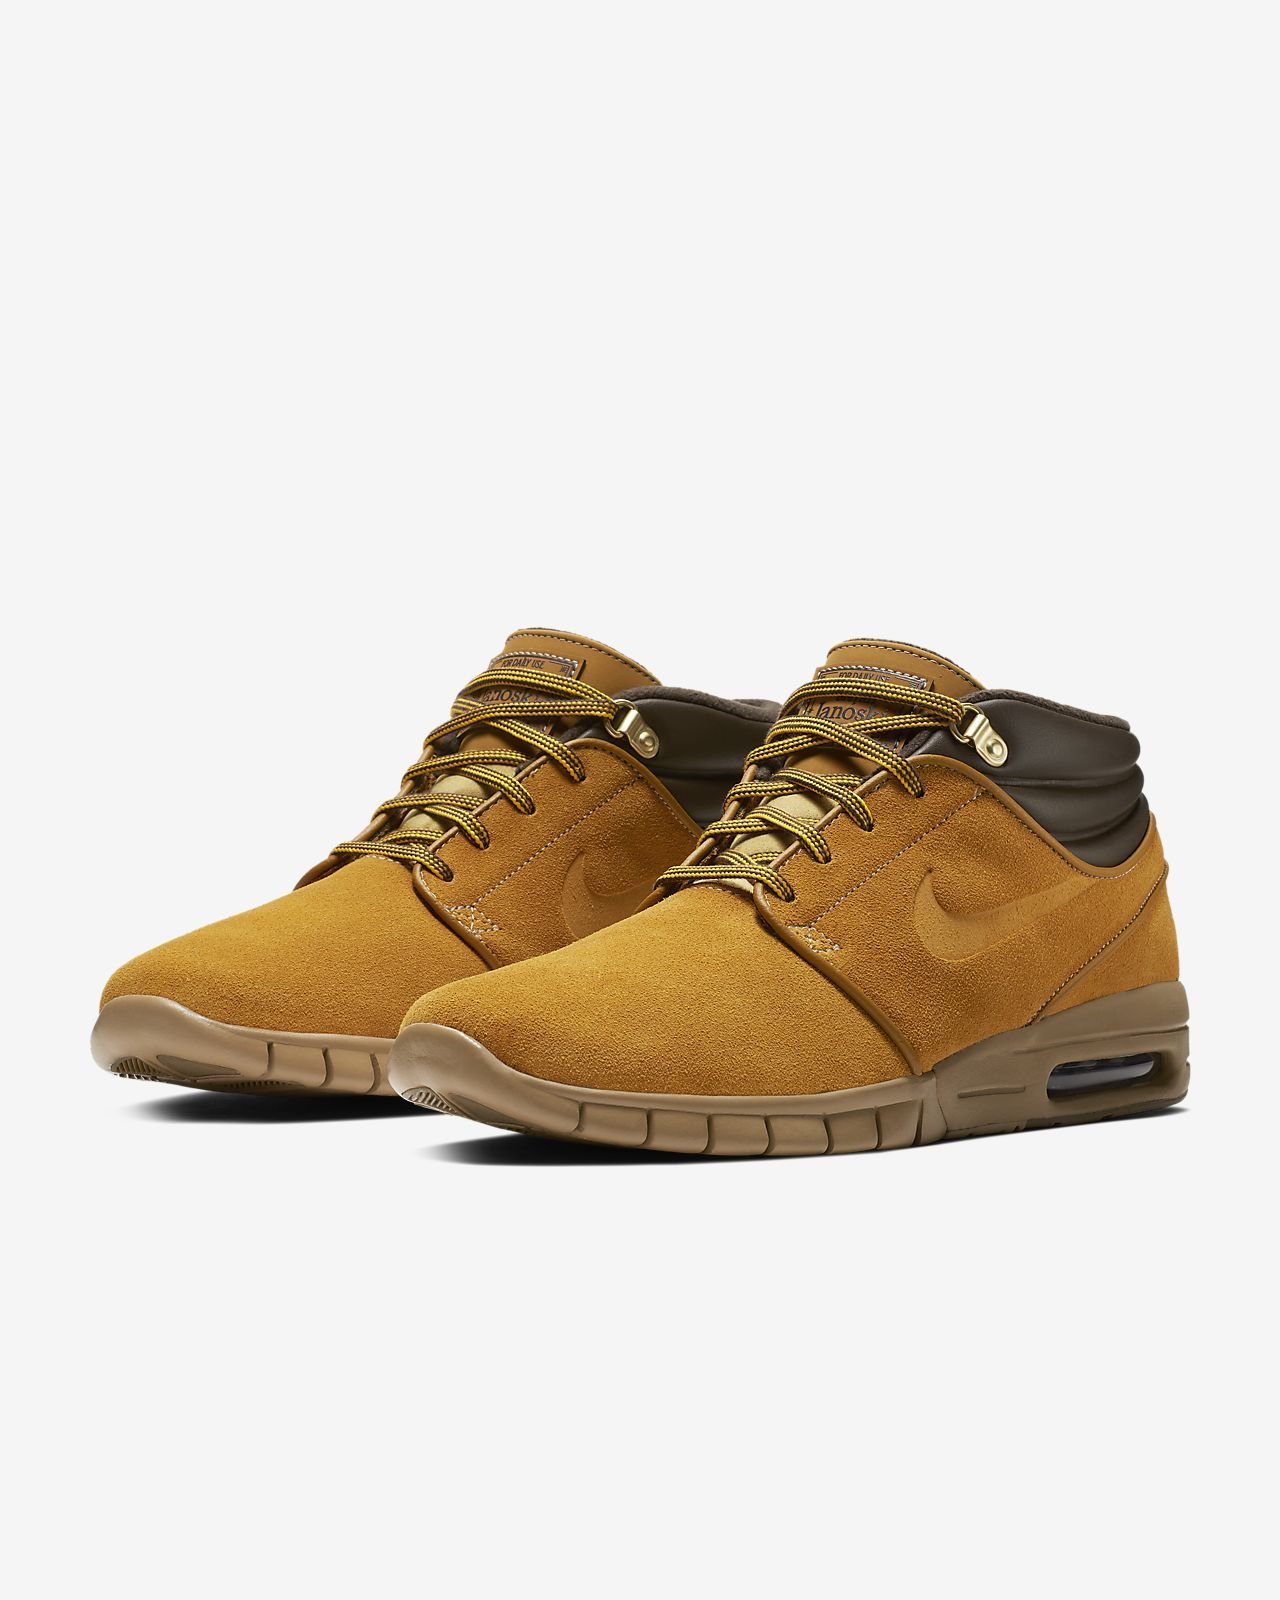 ad15c08ad2 SB Stefan Janoski Max Mid Premium Men's Skate Shoe in 2019 | buissa ...